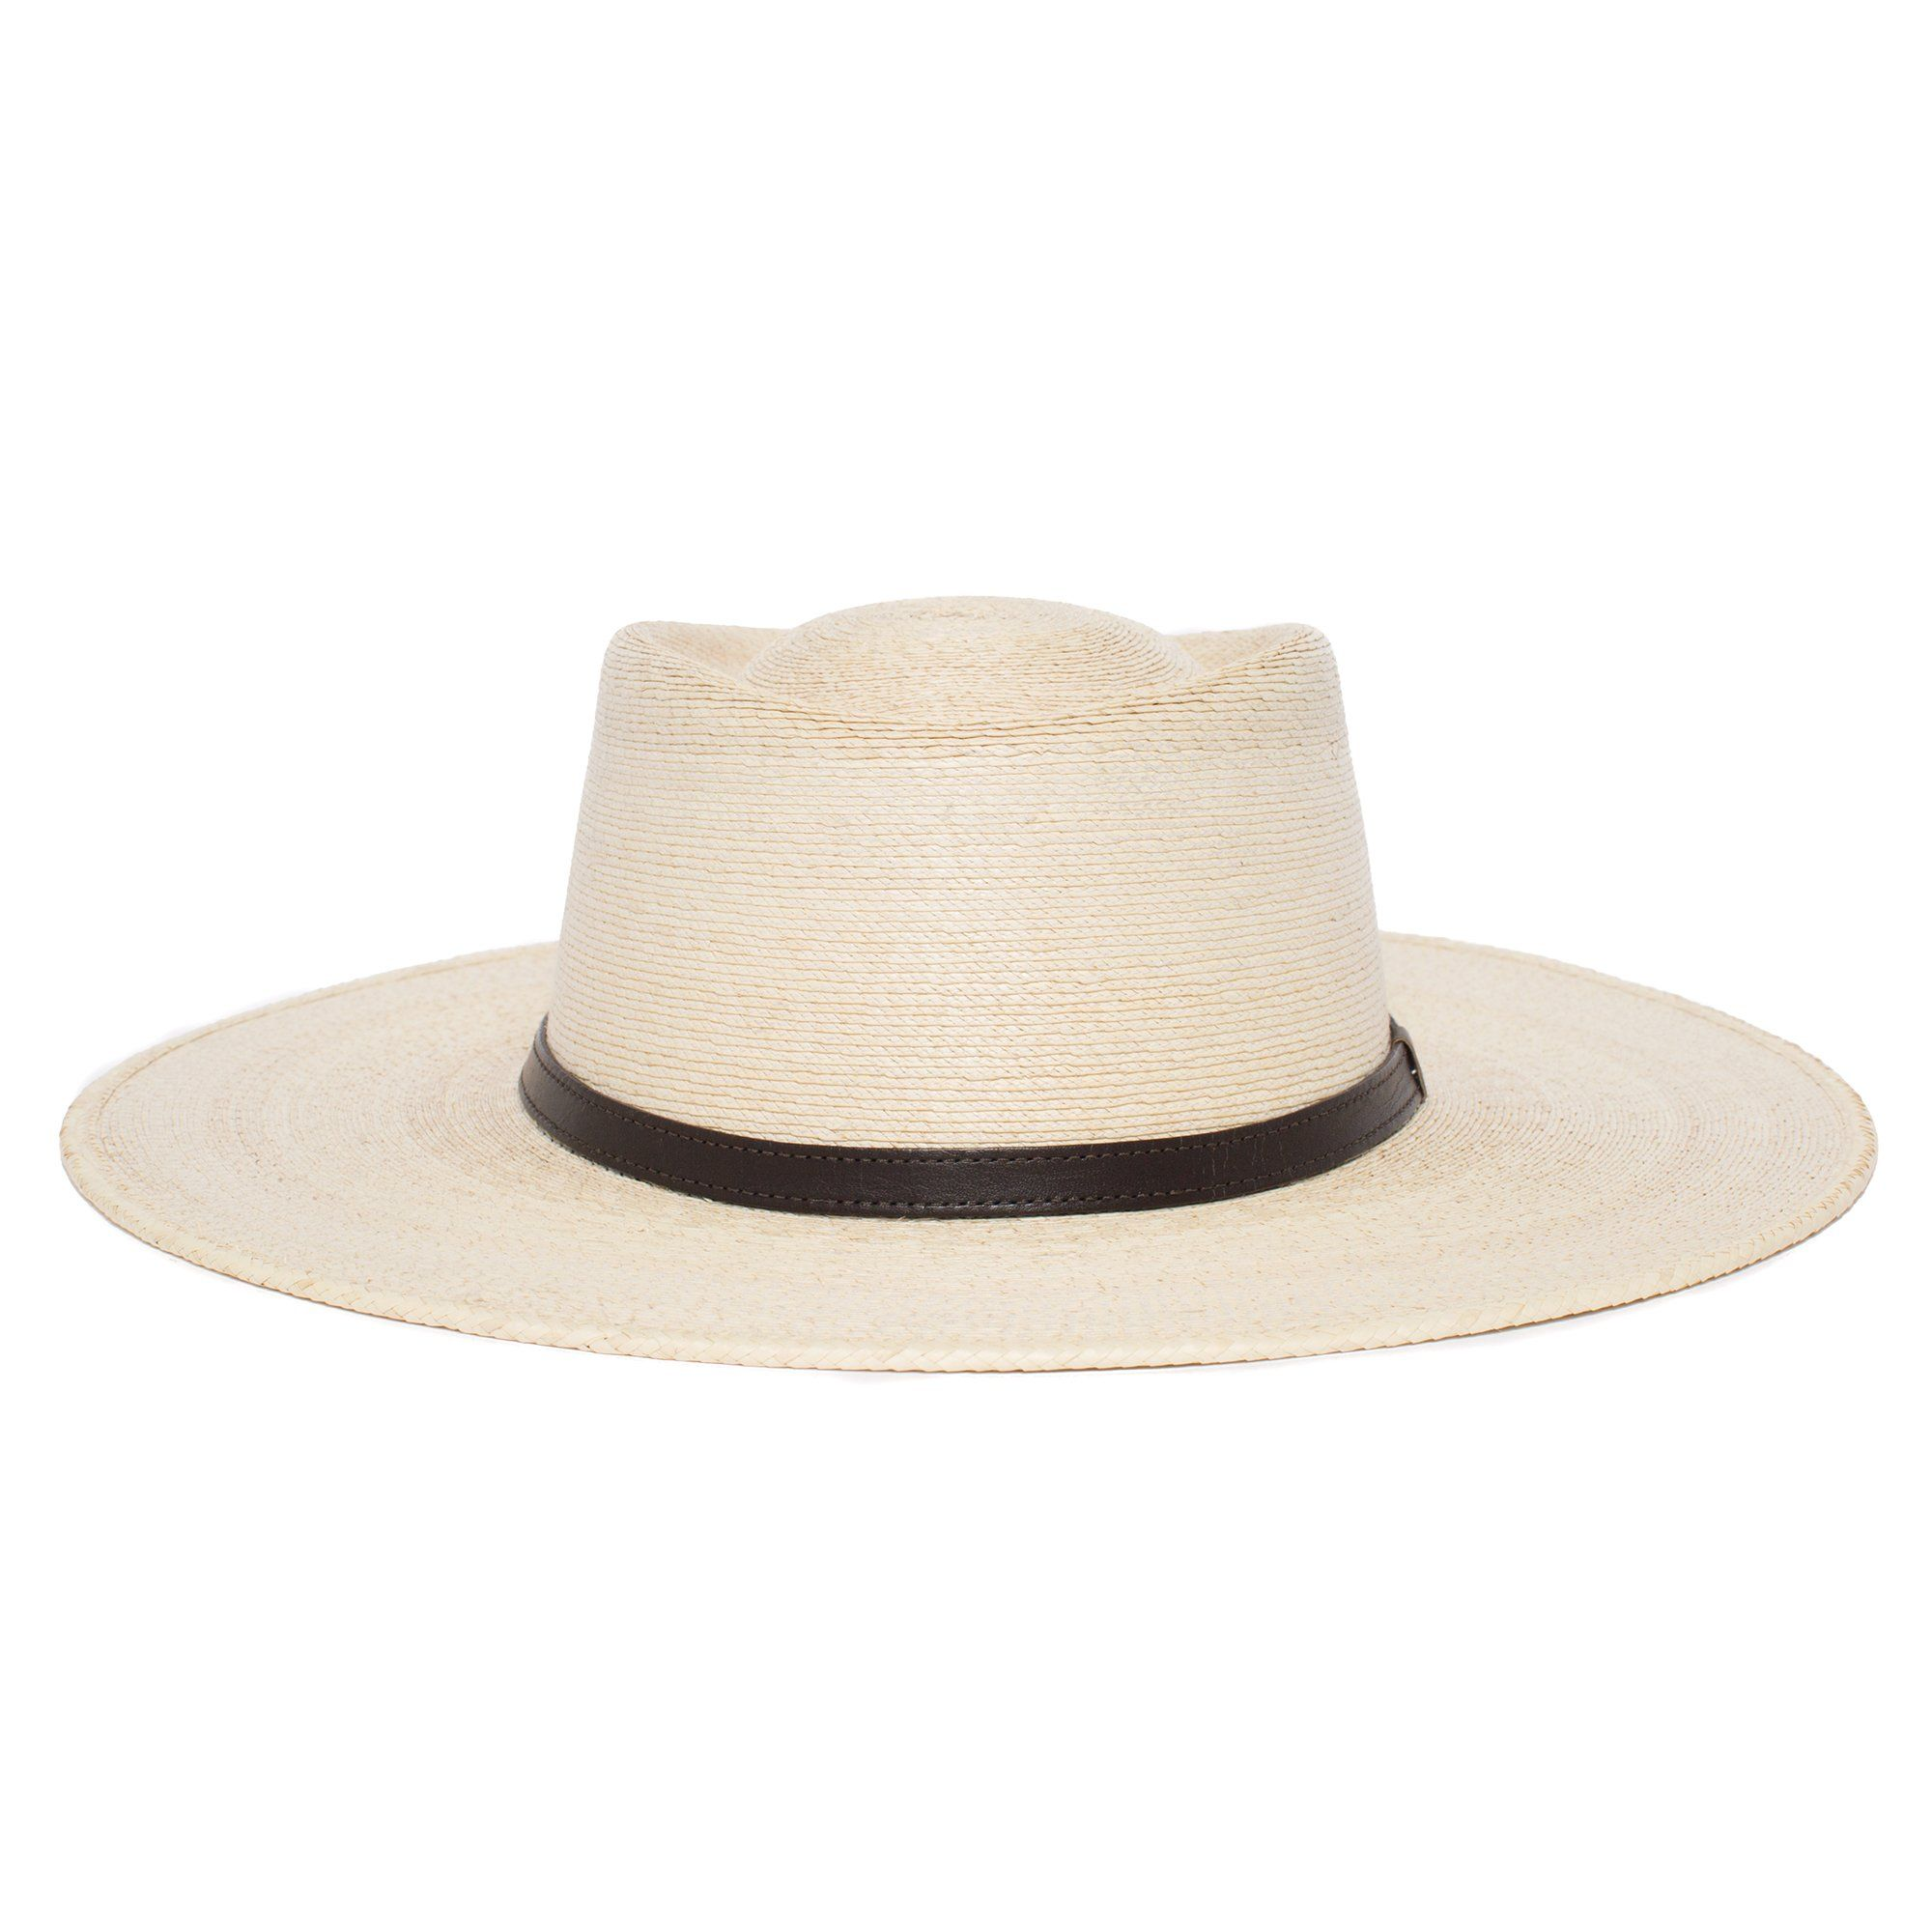 Goorin Baja Fedora Hat W Sweatband In White Size Xl In 2021 Hats For Men Hats Fedora